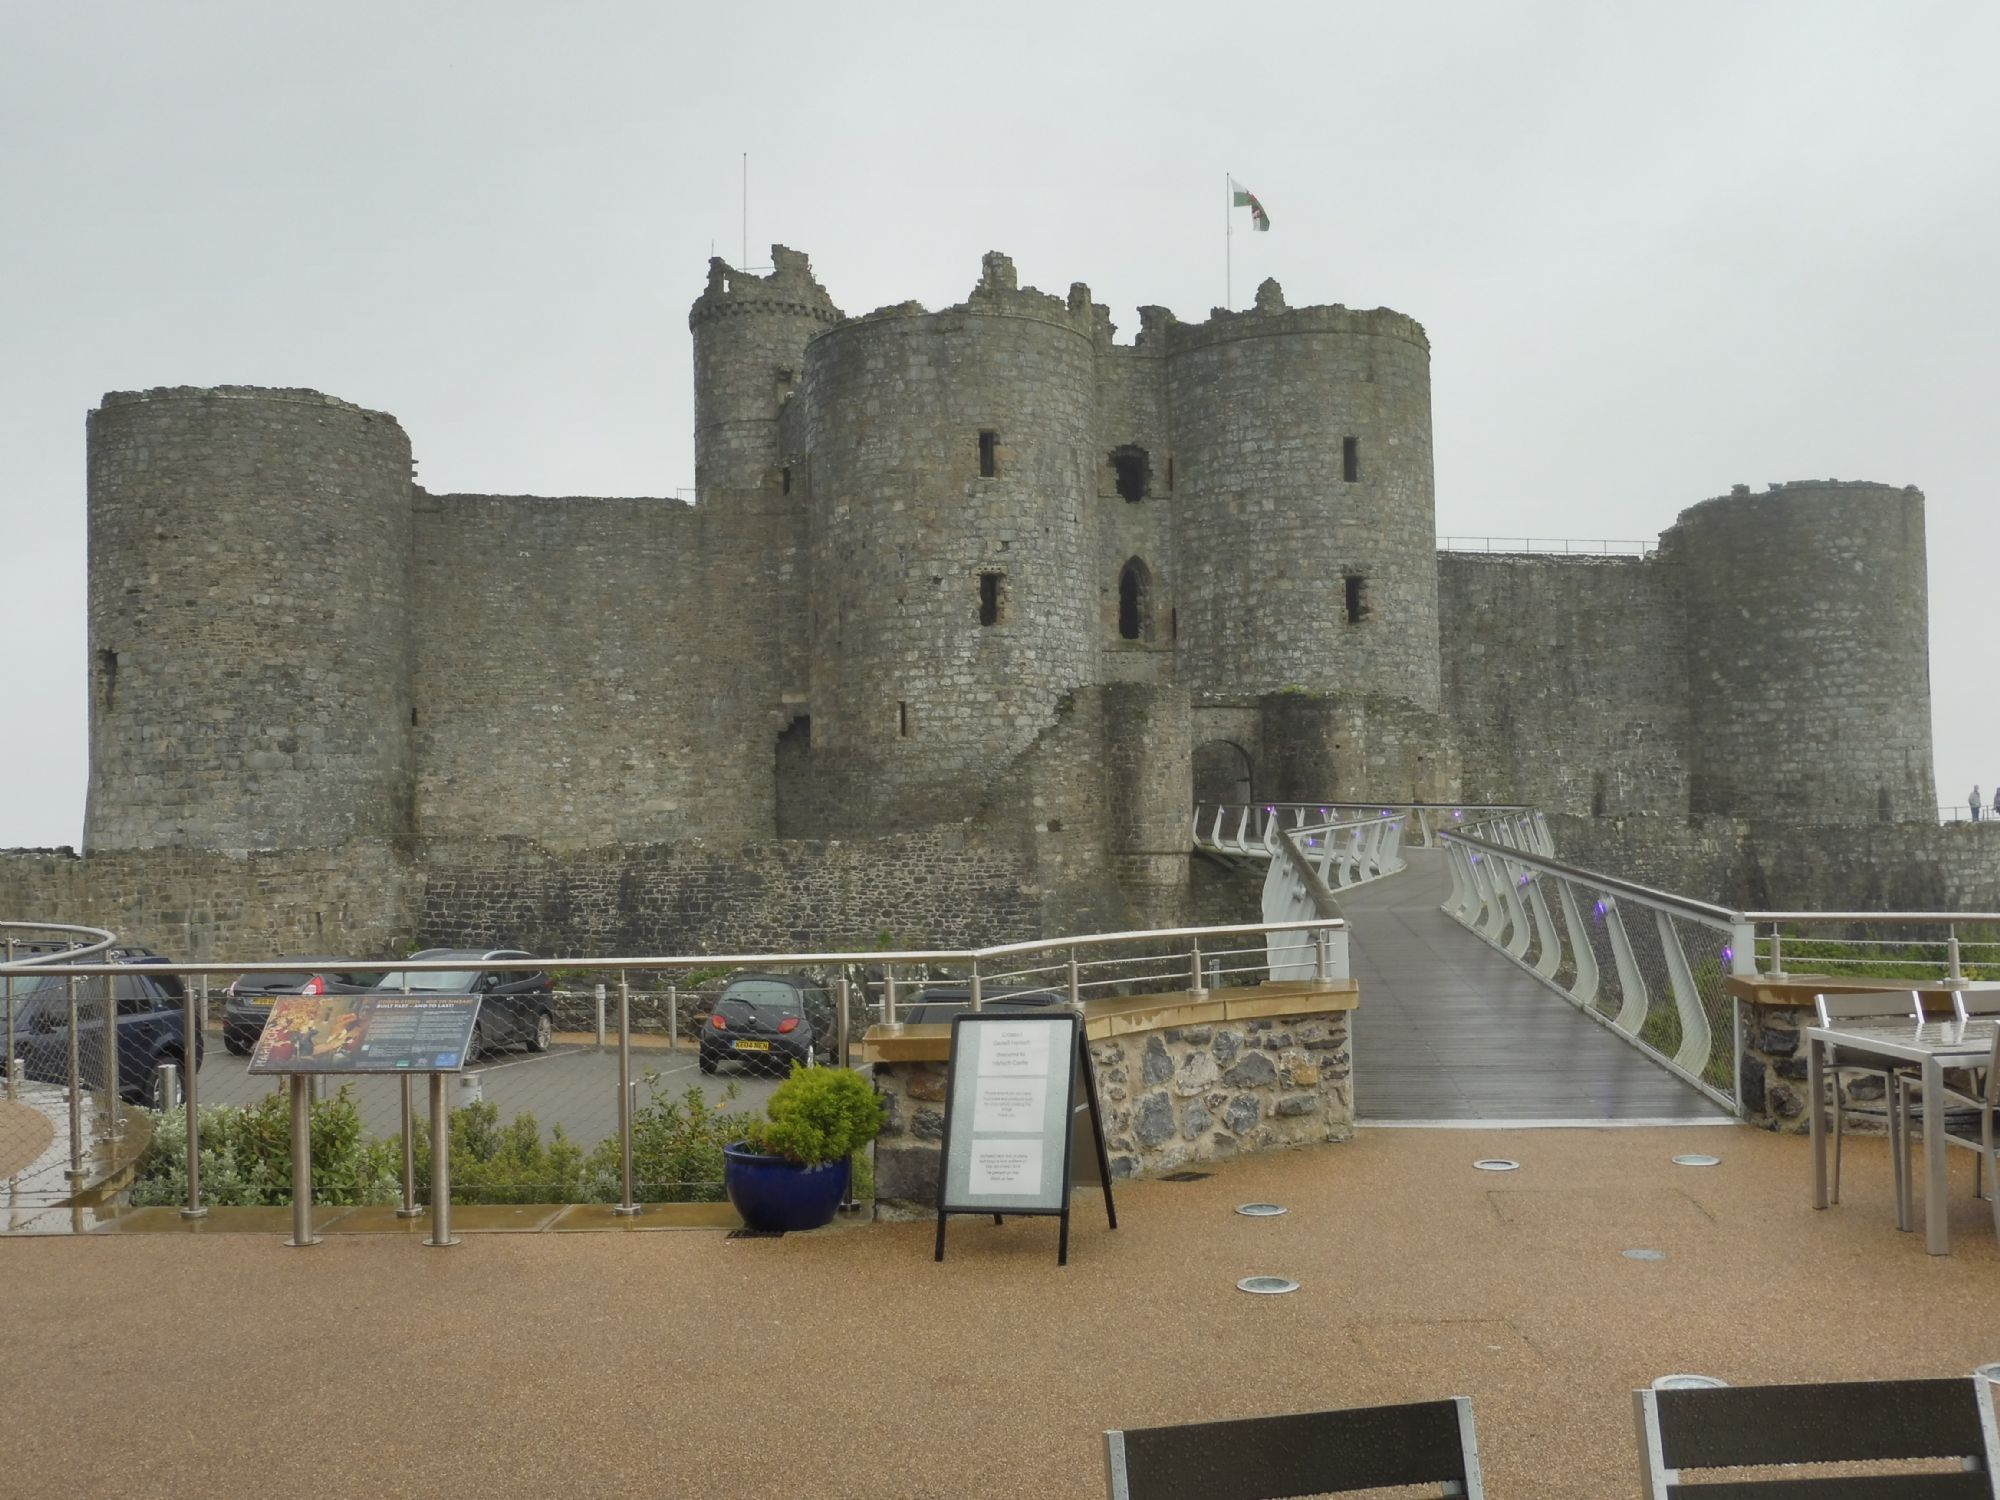 Castle Harlech